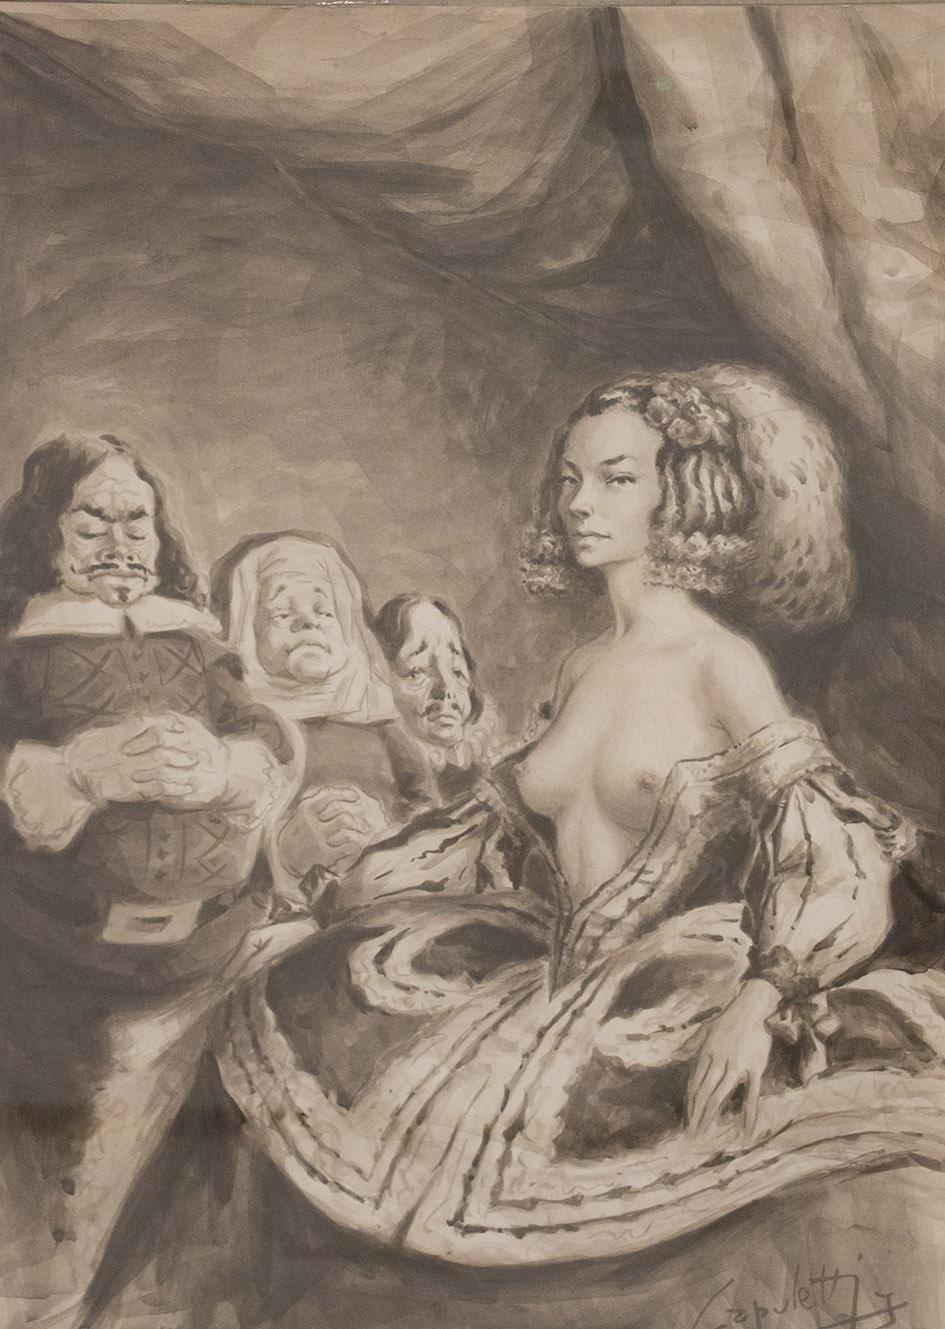 Jose Manuel Capuletti  Untitled  Watercolor on paper  65,5 x 47,5 cm